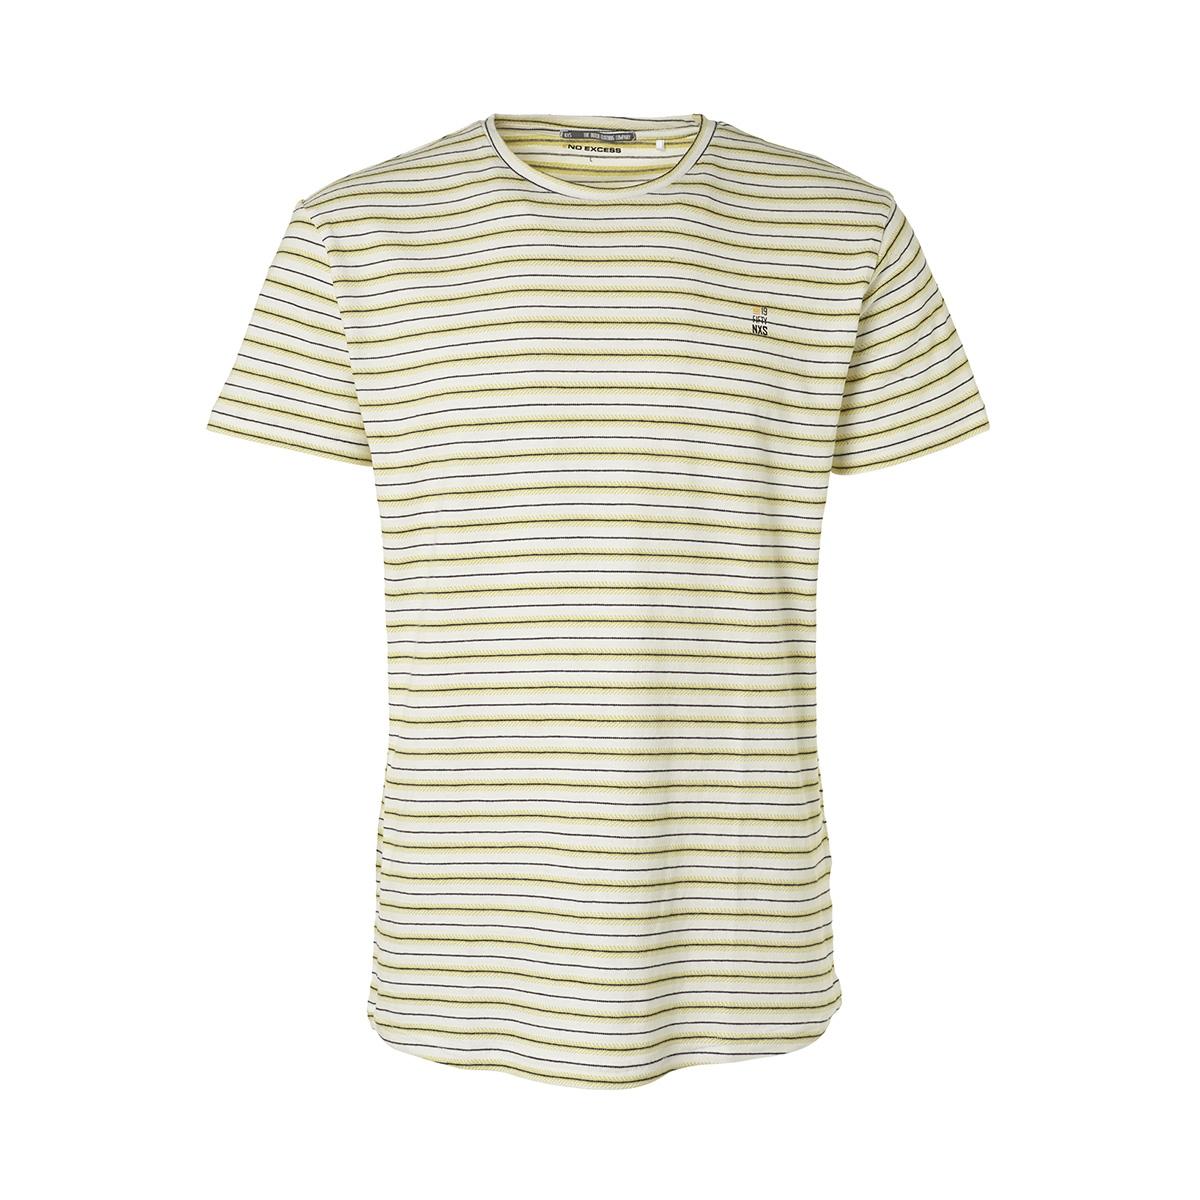 striped jersey crewneck t shirt 95340302 no-excess t-shirt 011 offwhite